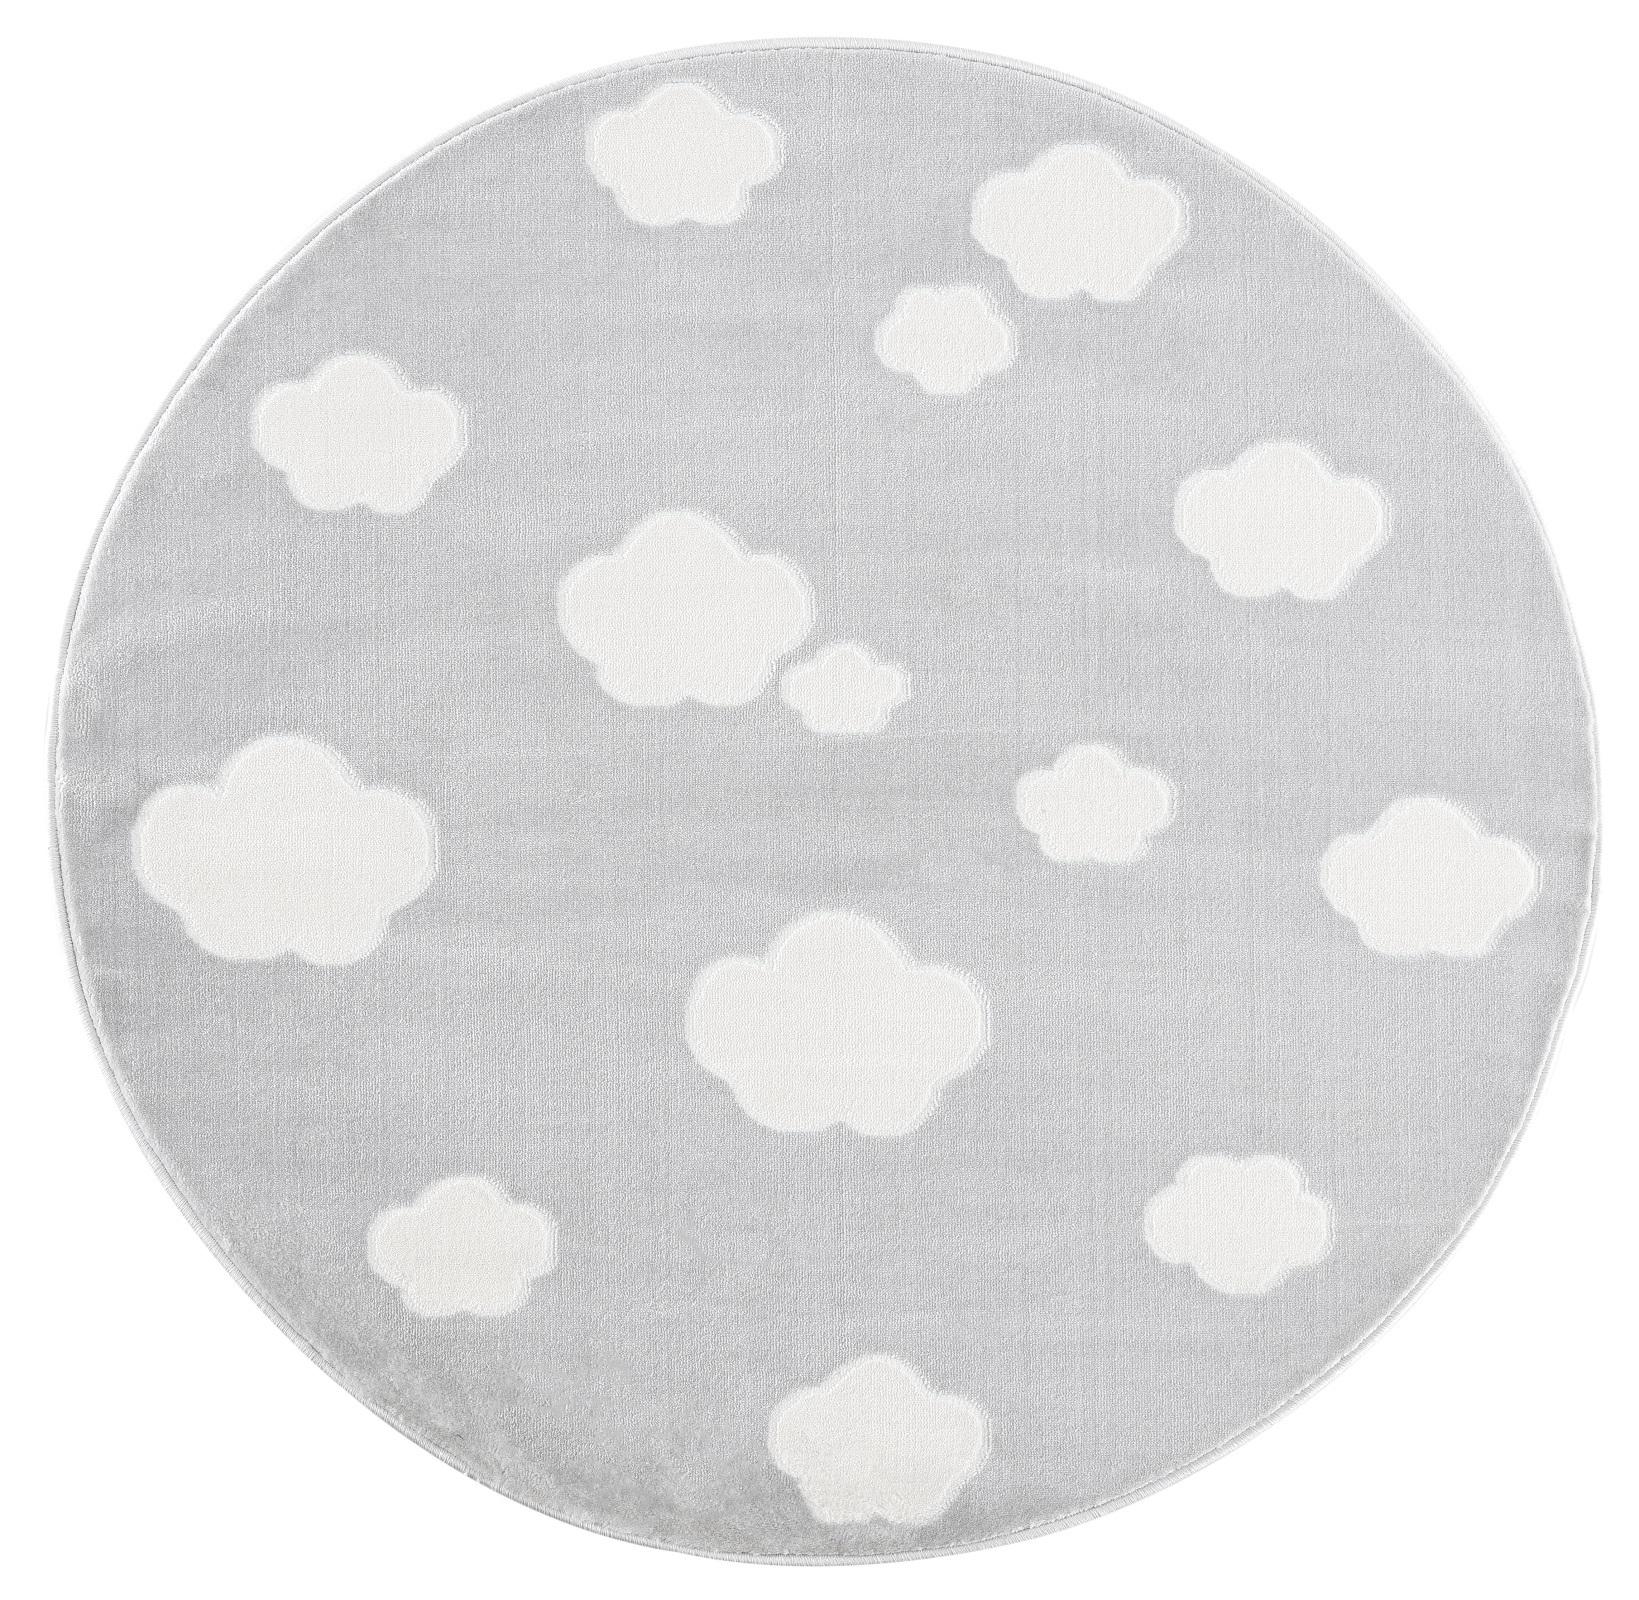 Dětský koberec mráčky - šedá/bílá 133cm